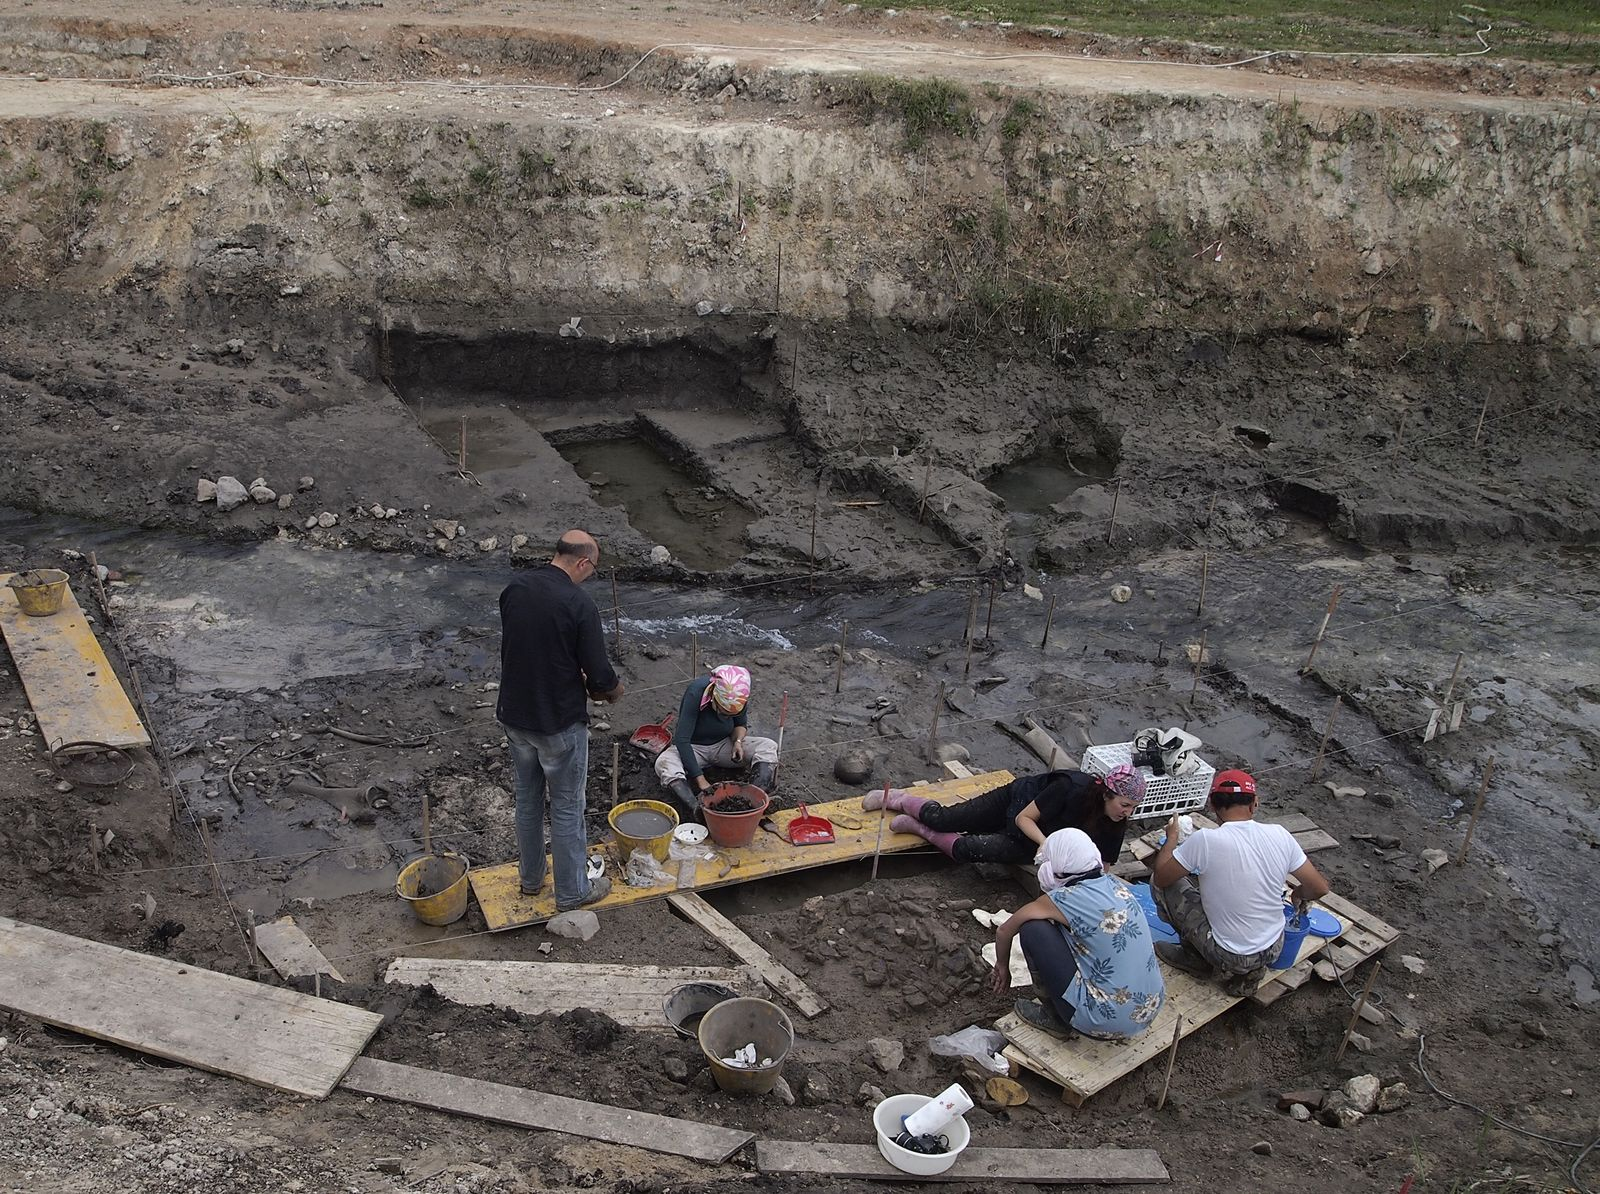 SPERRFRIST, 5. Februar 21.00 Uhr EINMALIGE VERWENDUNG Neandertaler / Holz